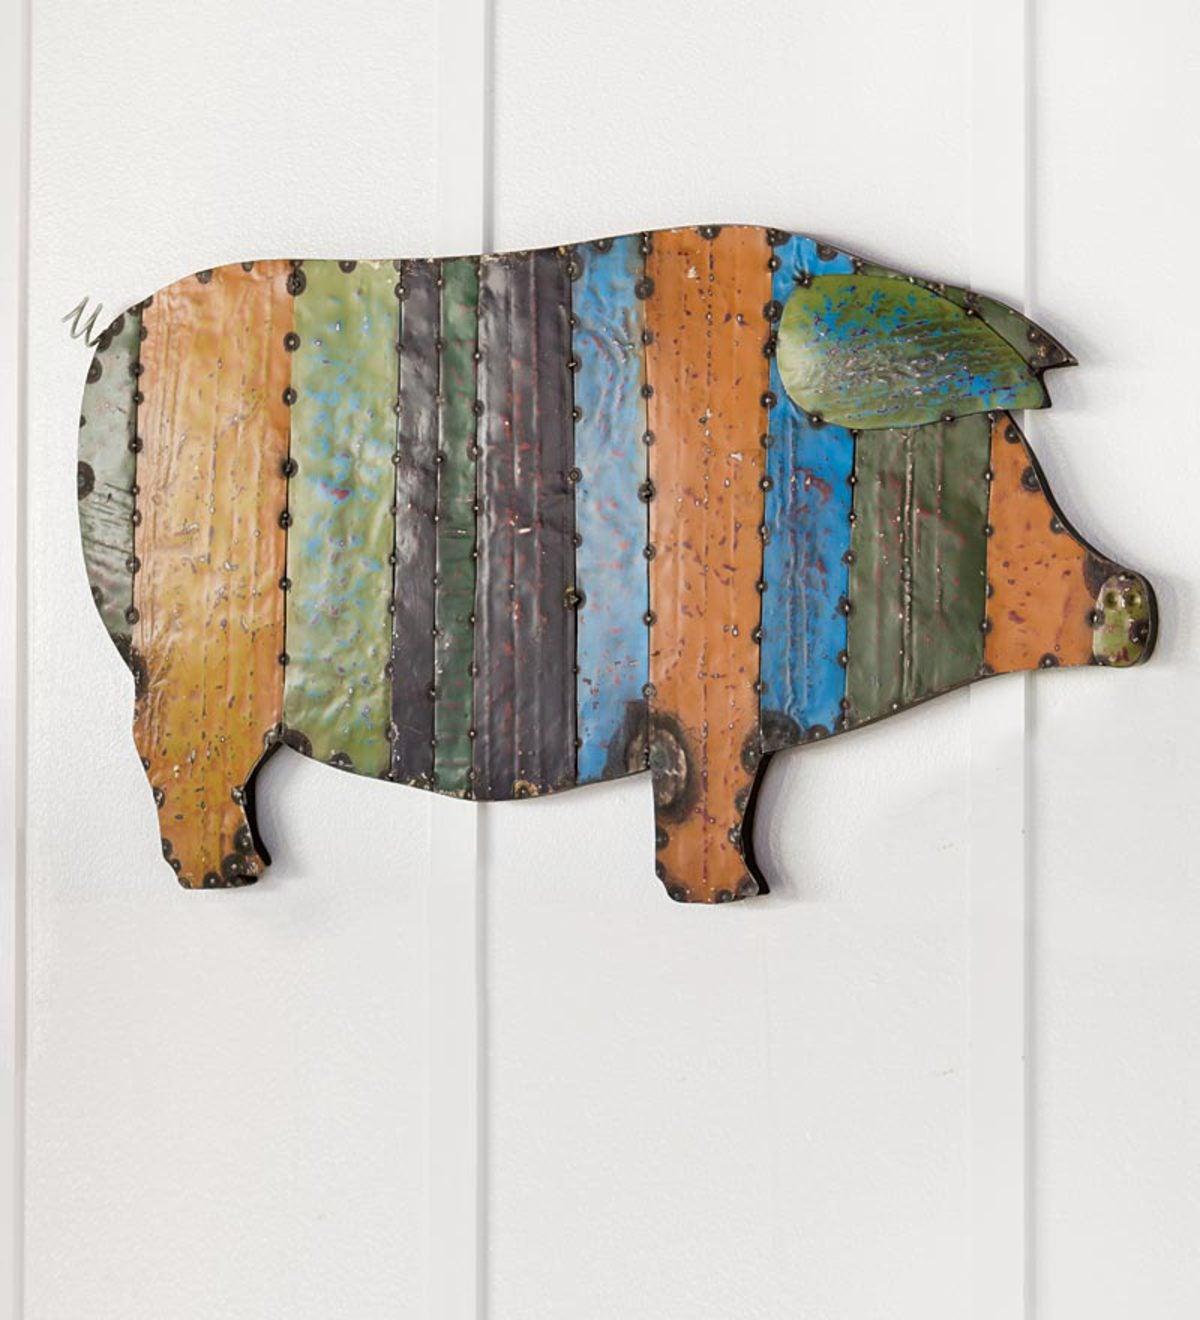 Recycled Metal Handmade Pig Wall Art